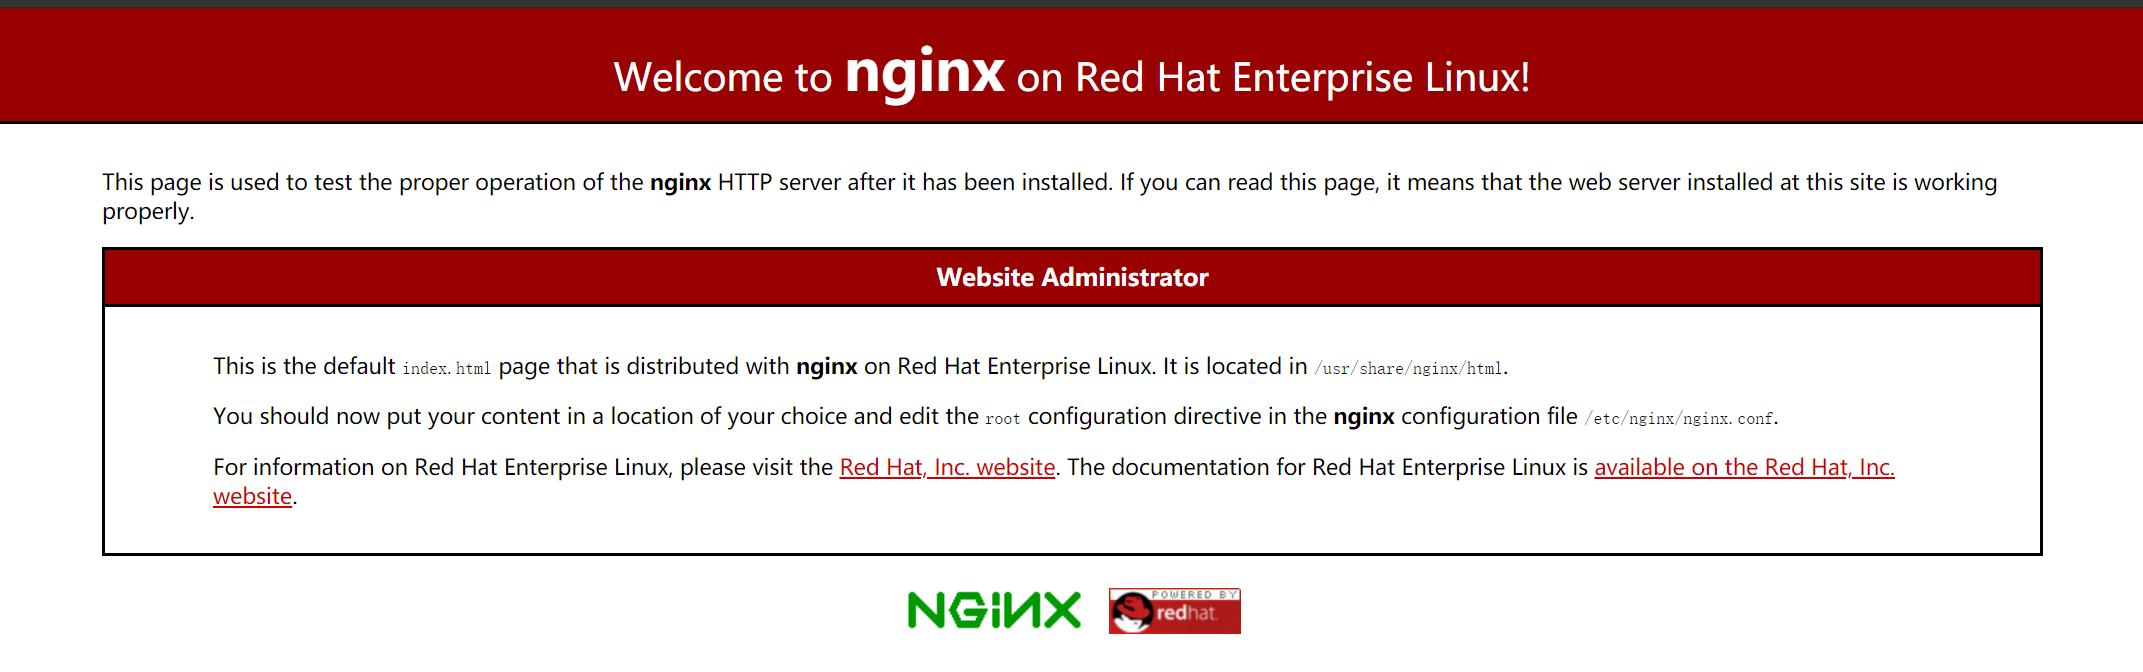 nginx-index